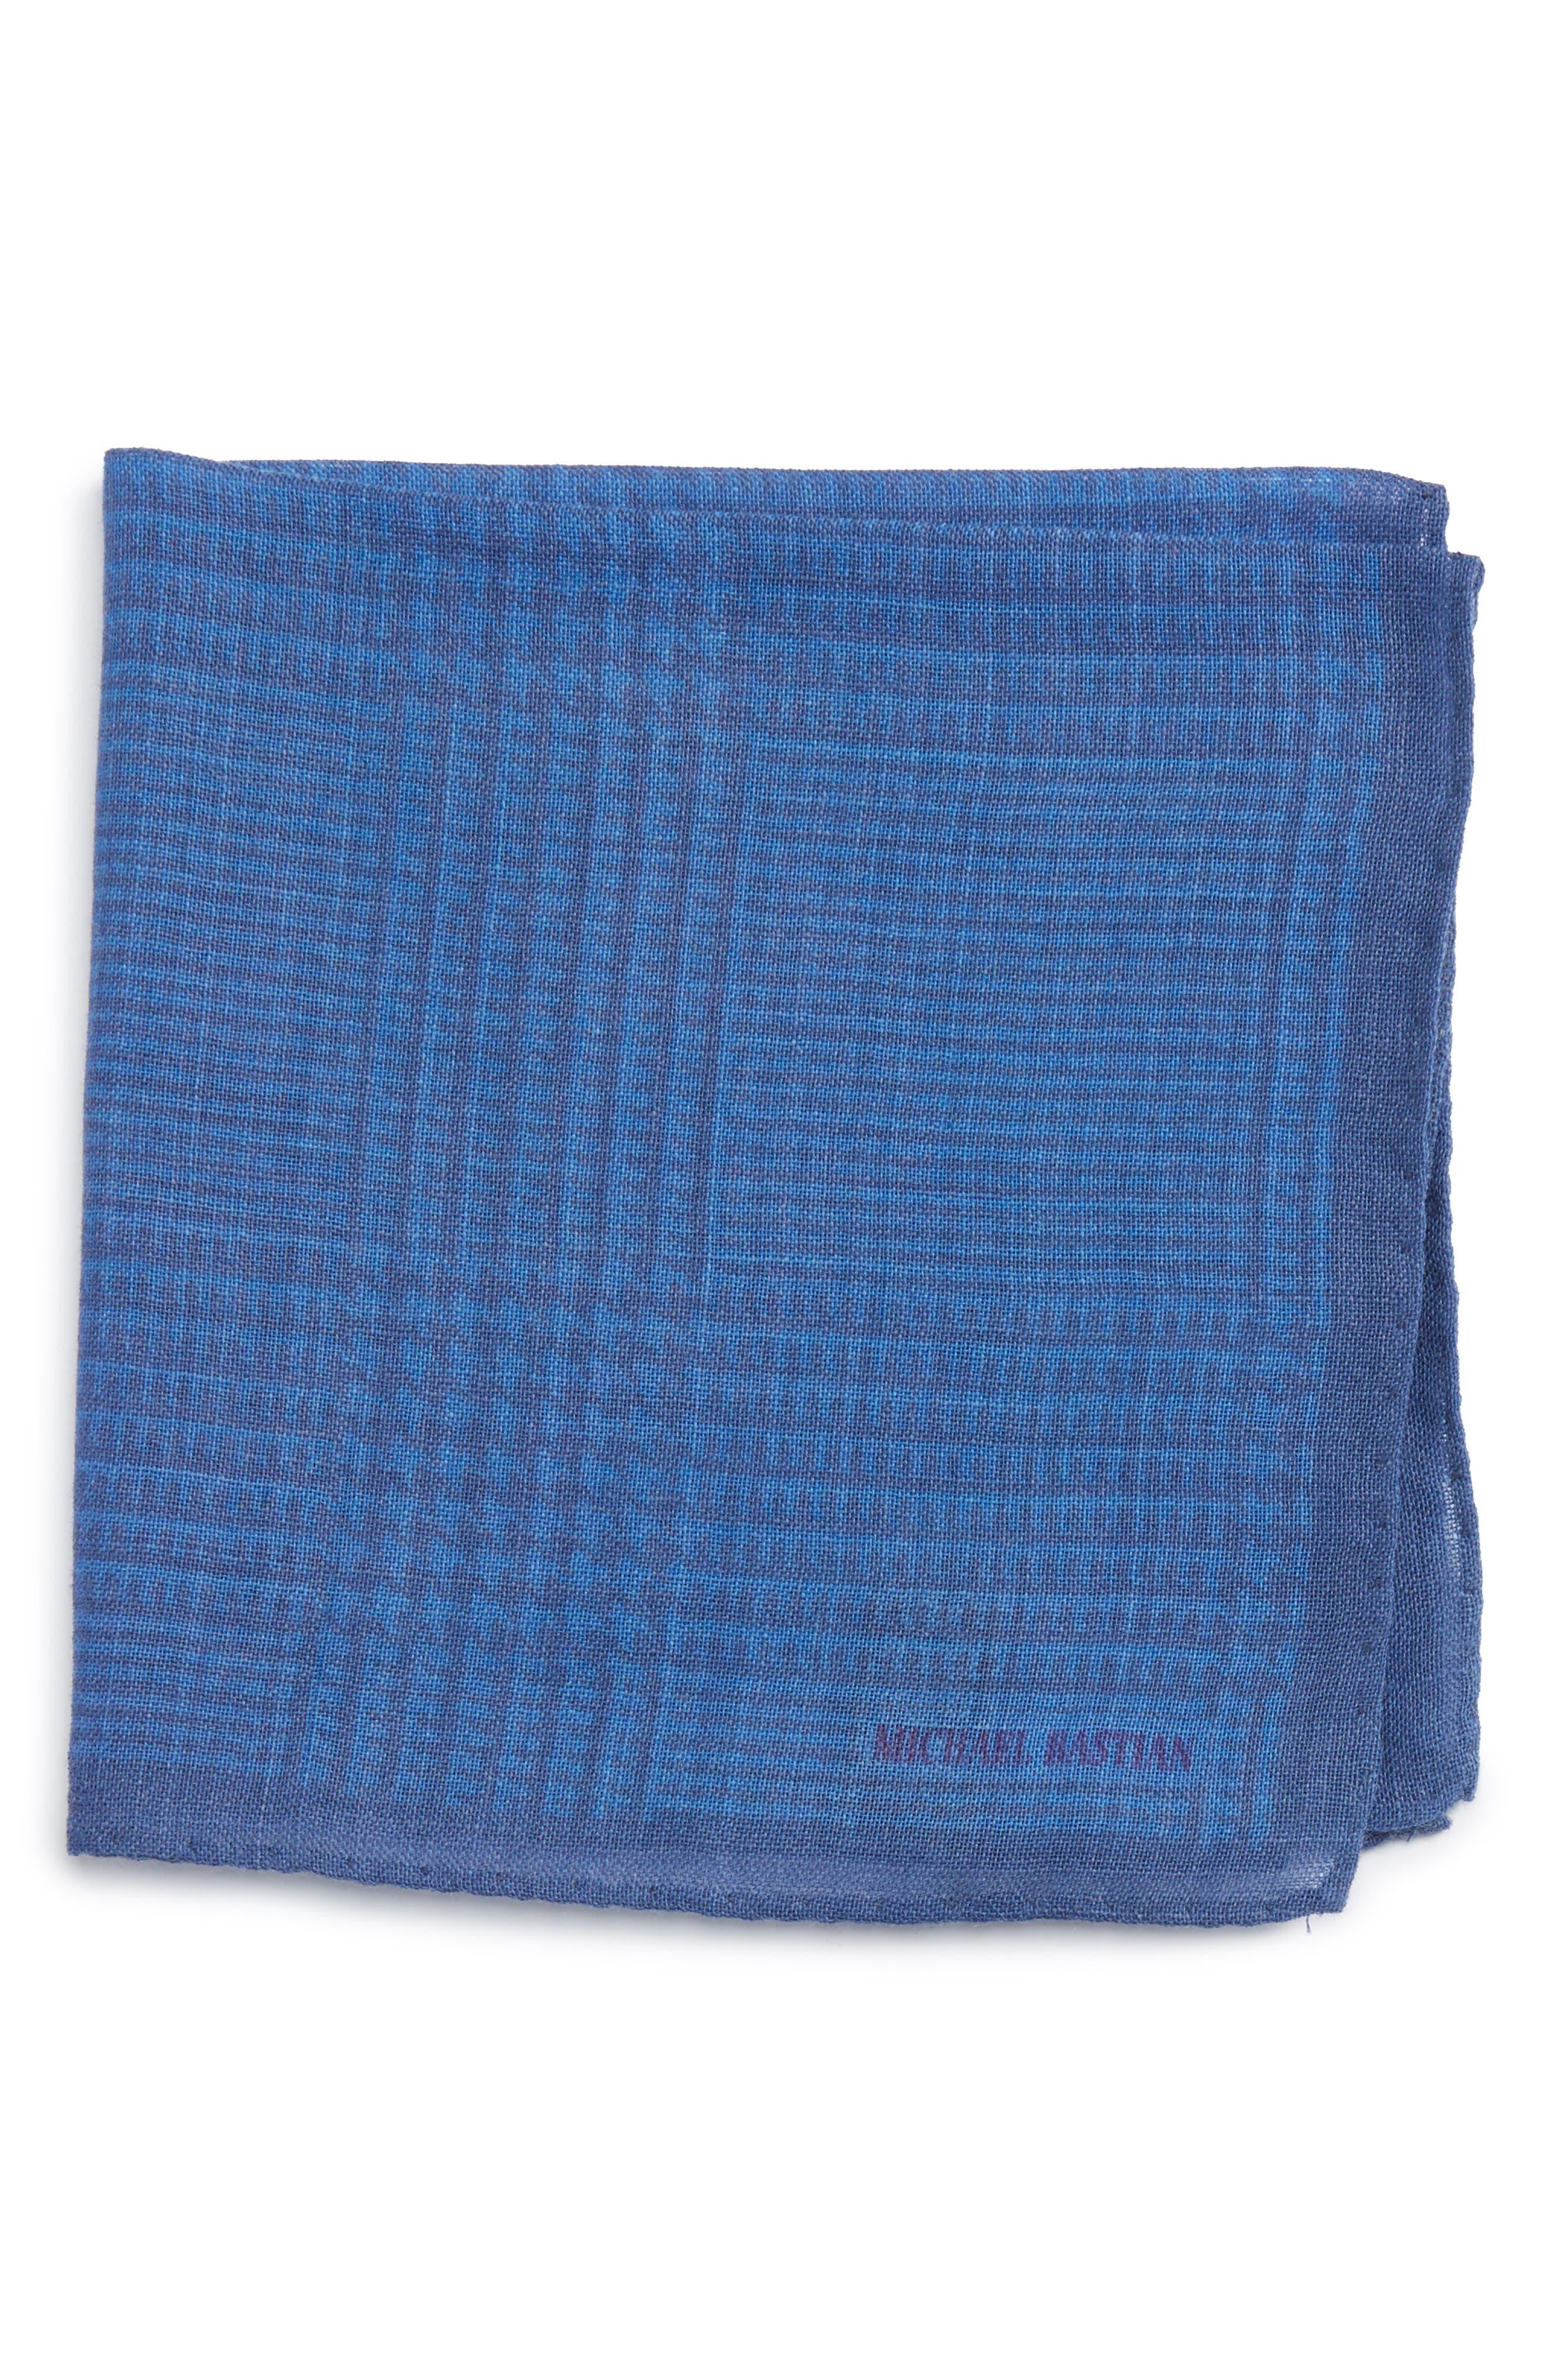 Grid Pocket Square,                             Main thumbnail 1, color,                             429